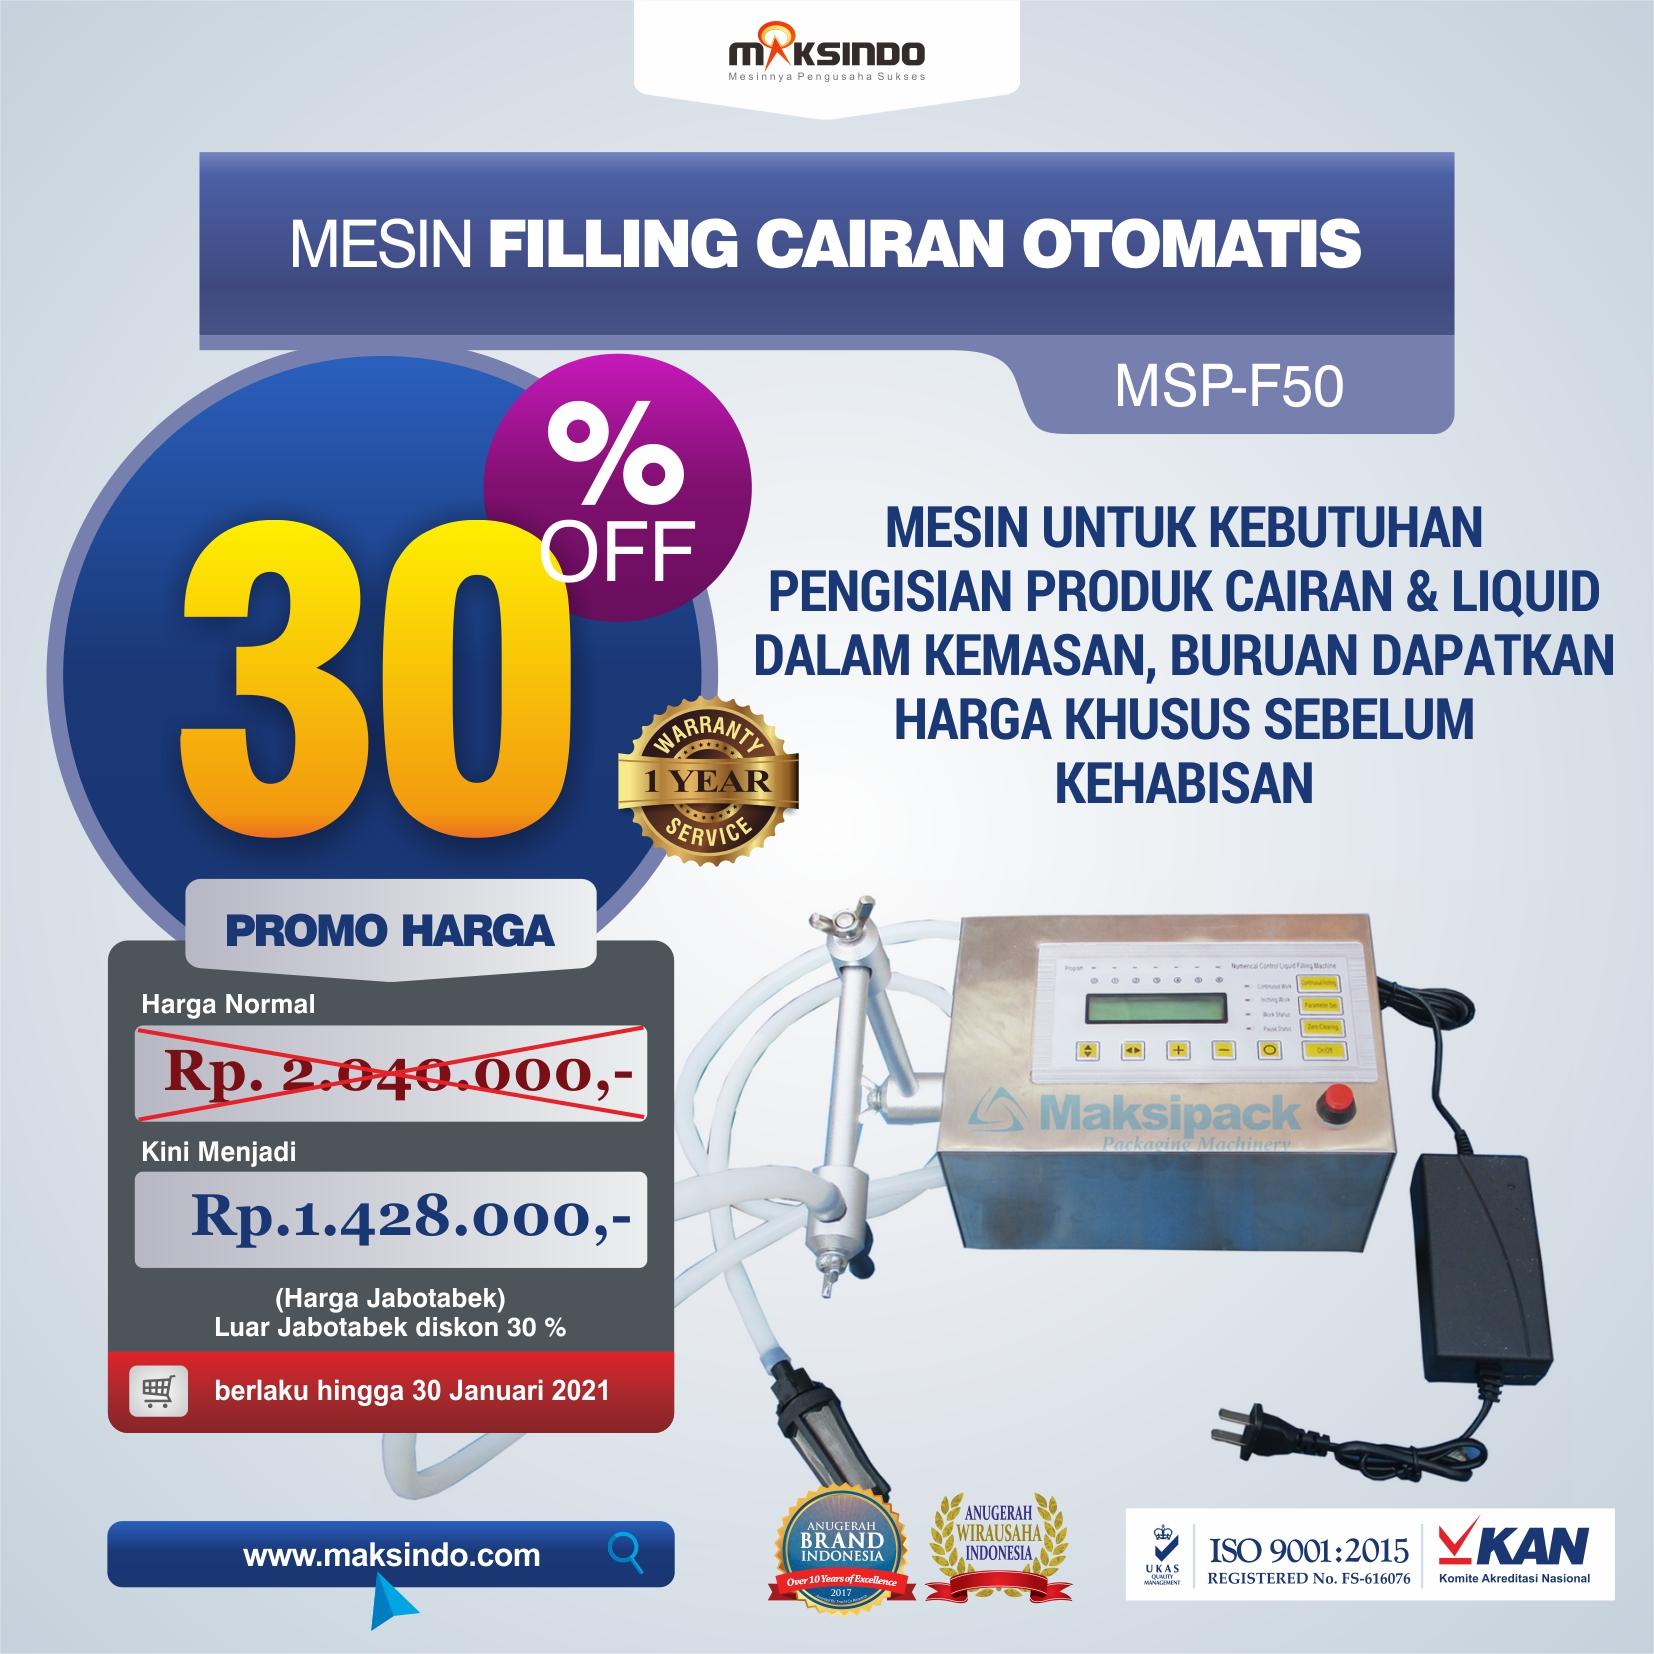 Mesin Filling Cairan Otomatis MSP-F50